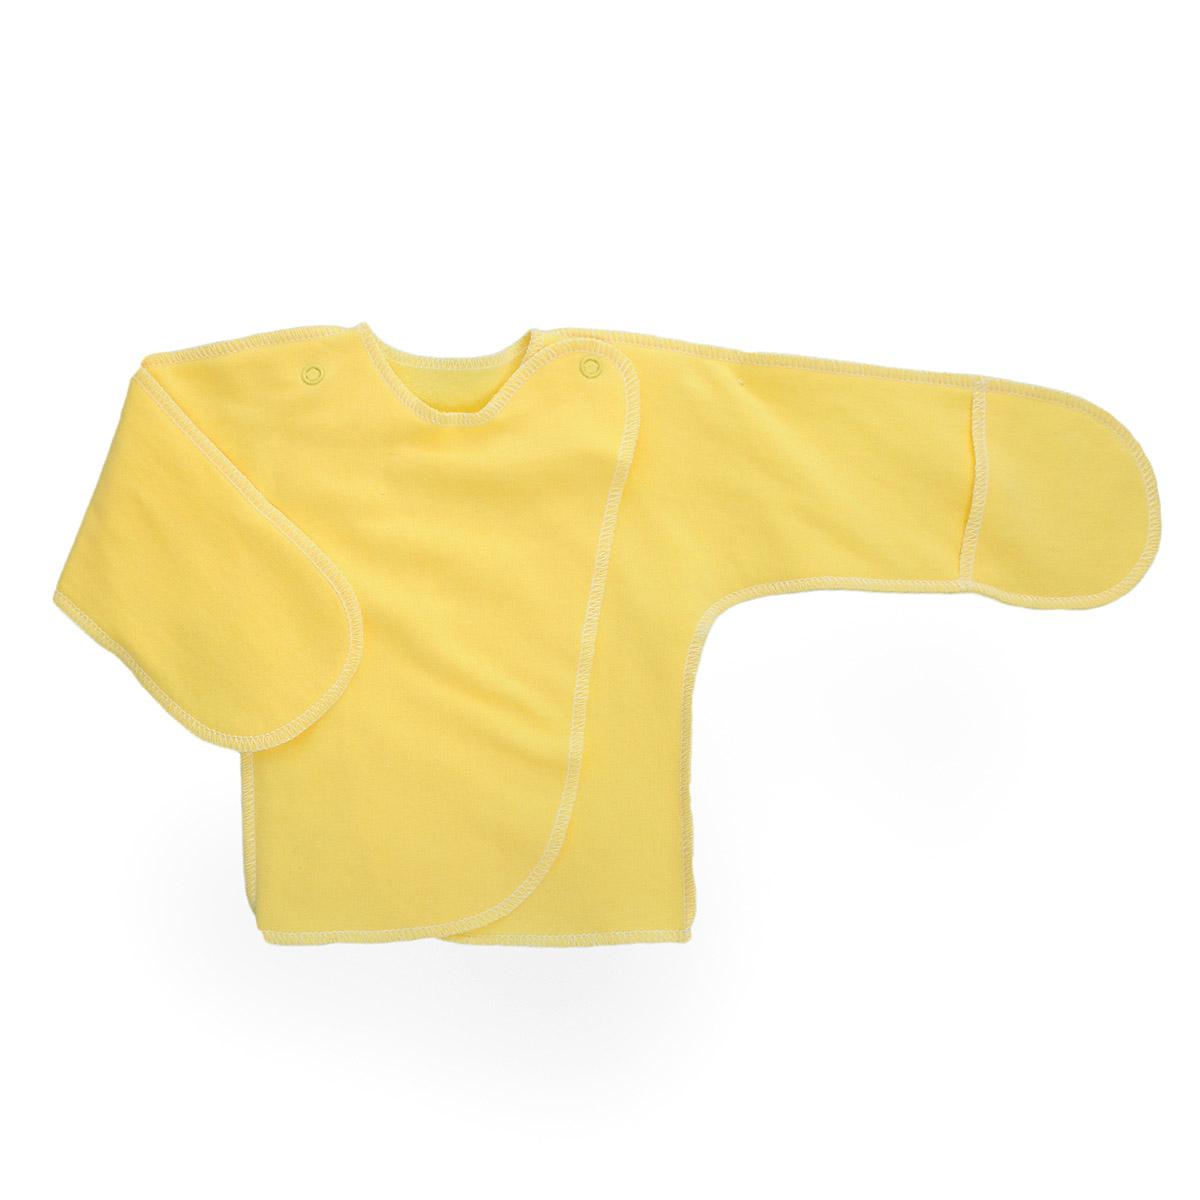 Распашонка Трон-Плюс, цвет: желтый. 5023. Размер 56, 1 месяц